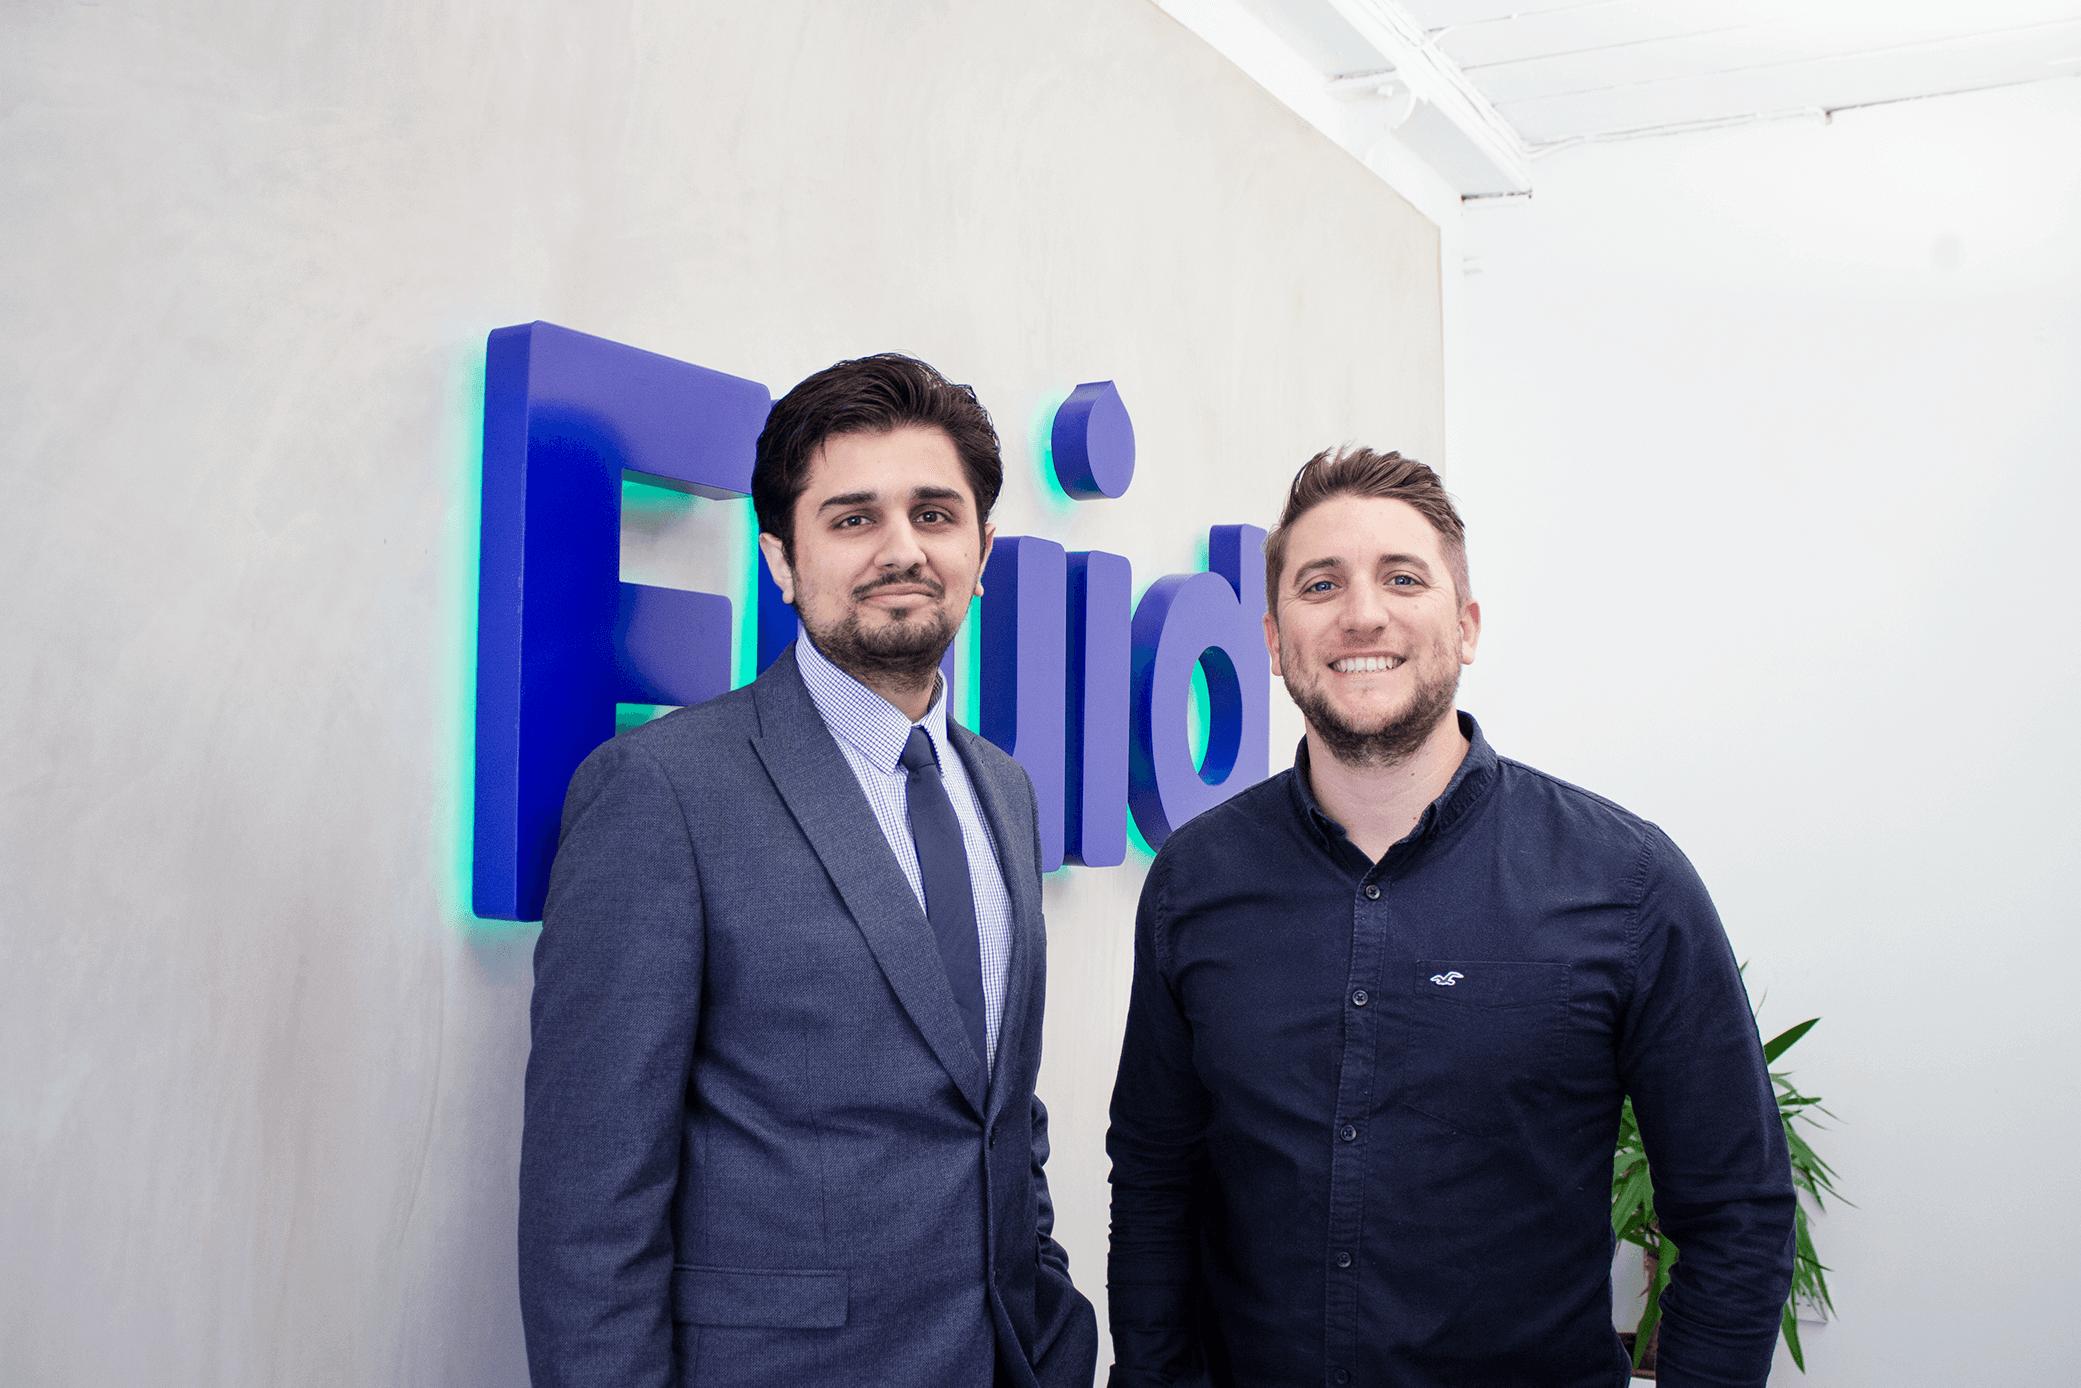 Fluid Digital Appoints a New Account Director & Senior Magento Developer